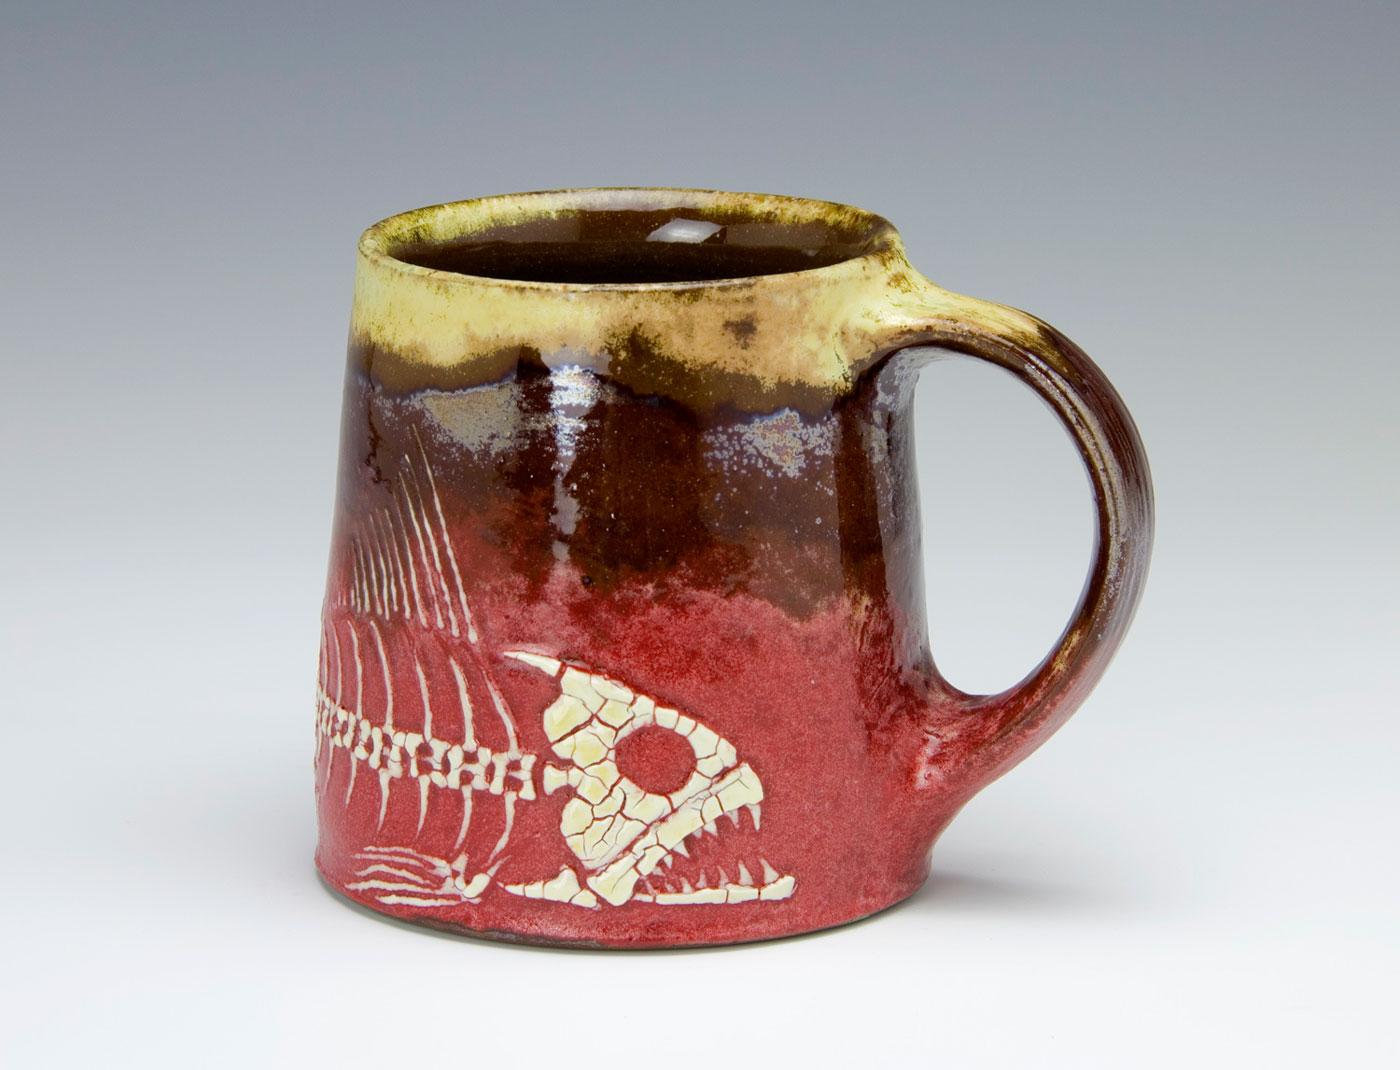 Fossil-Fish-Handmade-Mug-Bruce-Gholson.jpg